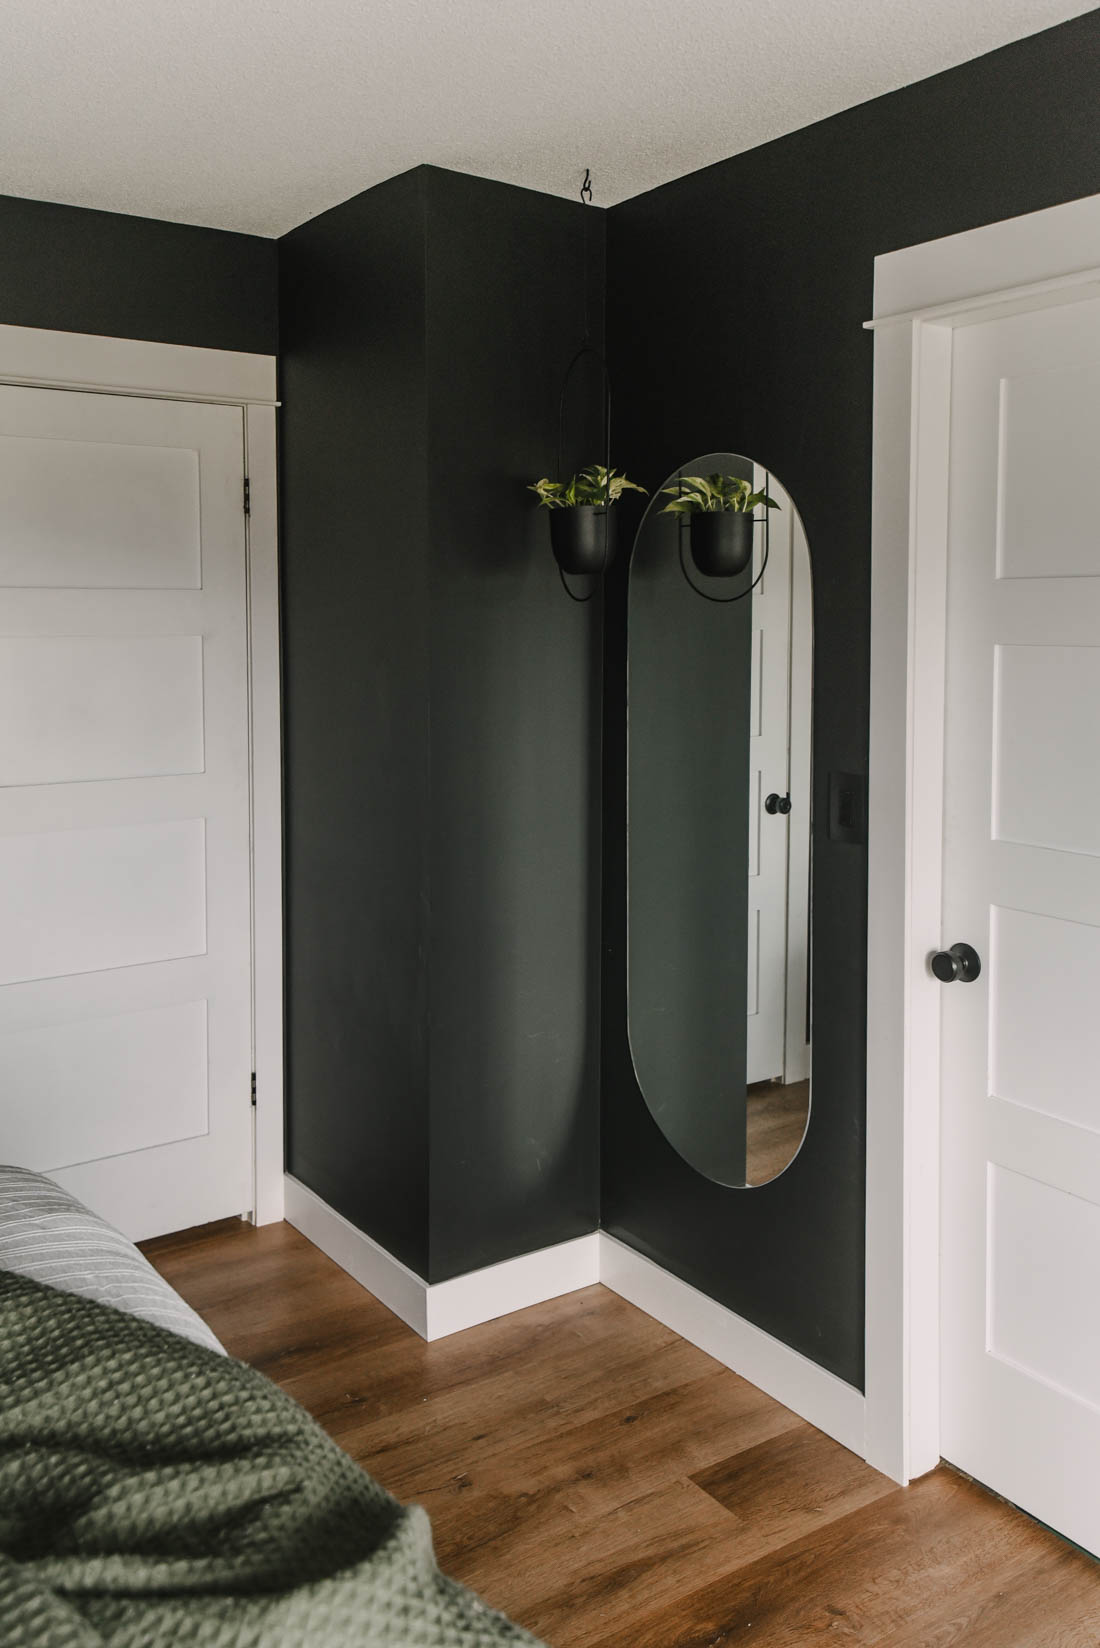 Moody black bedroom decor